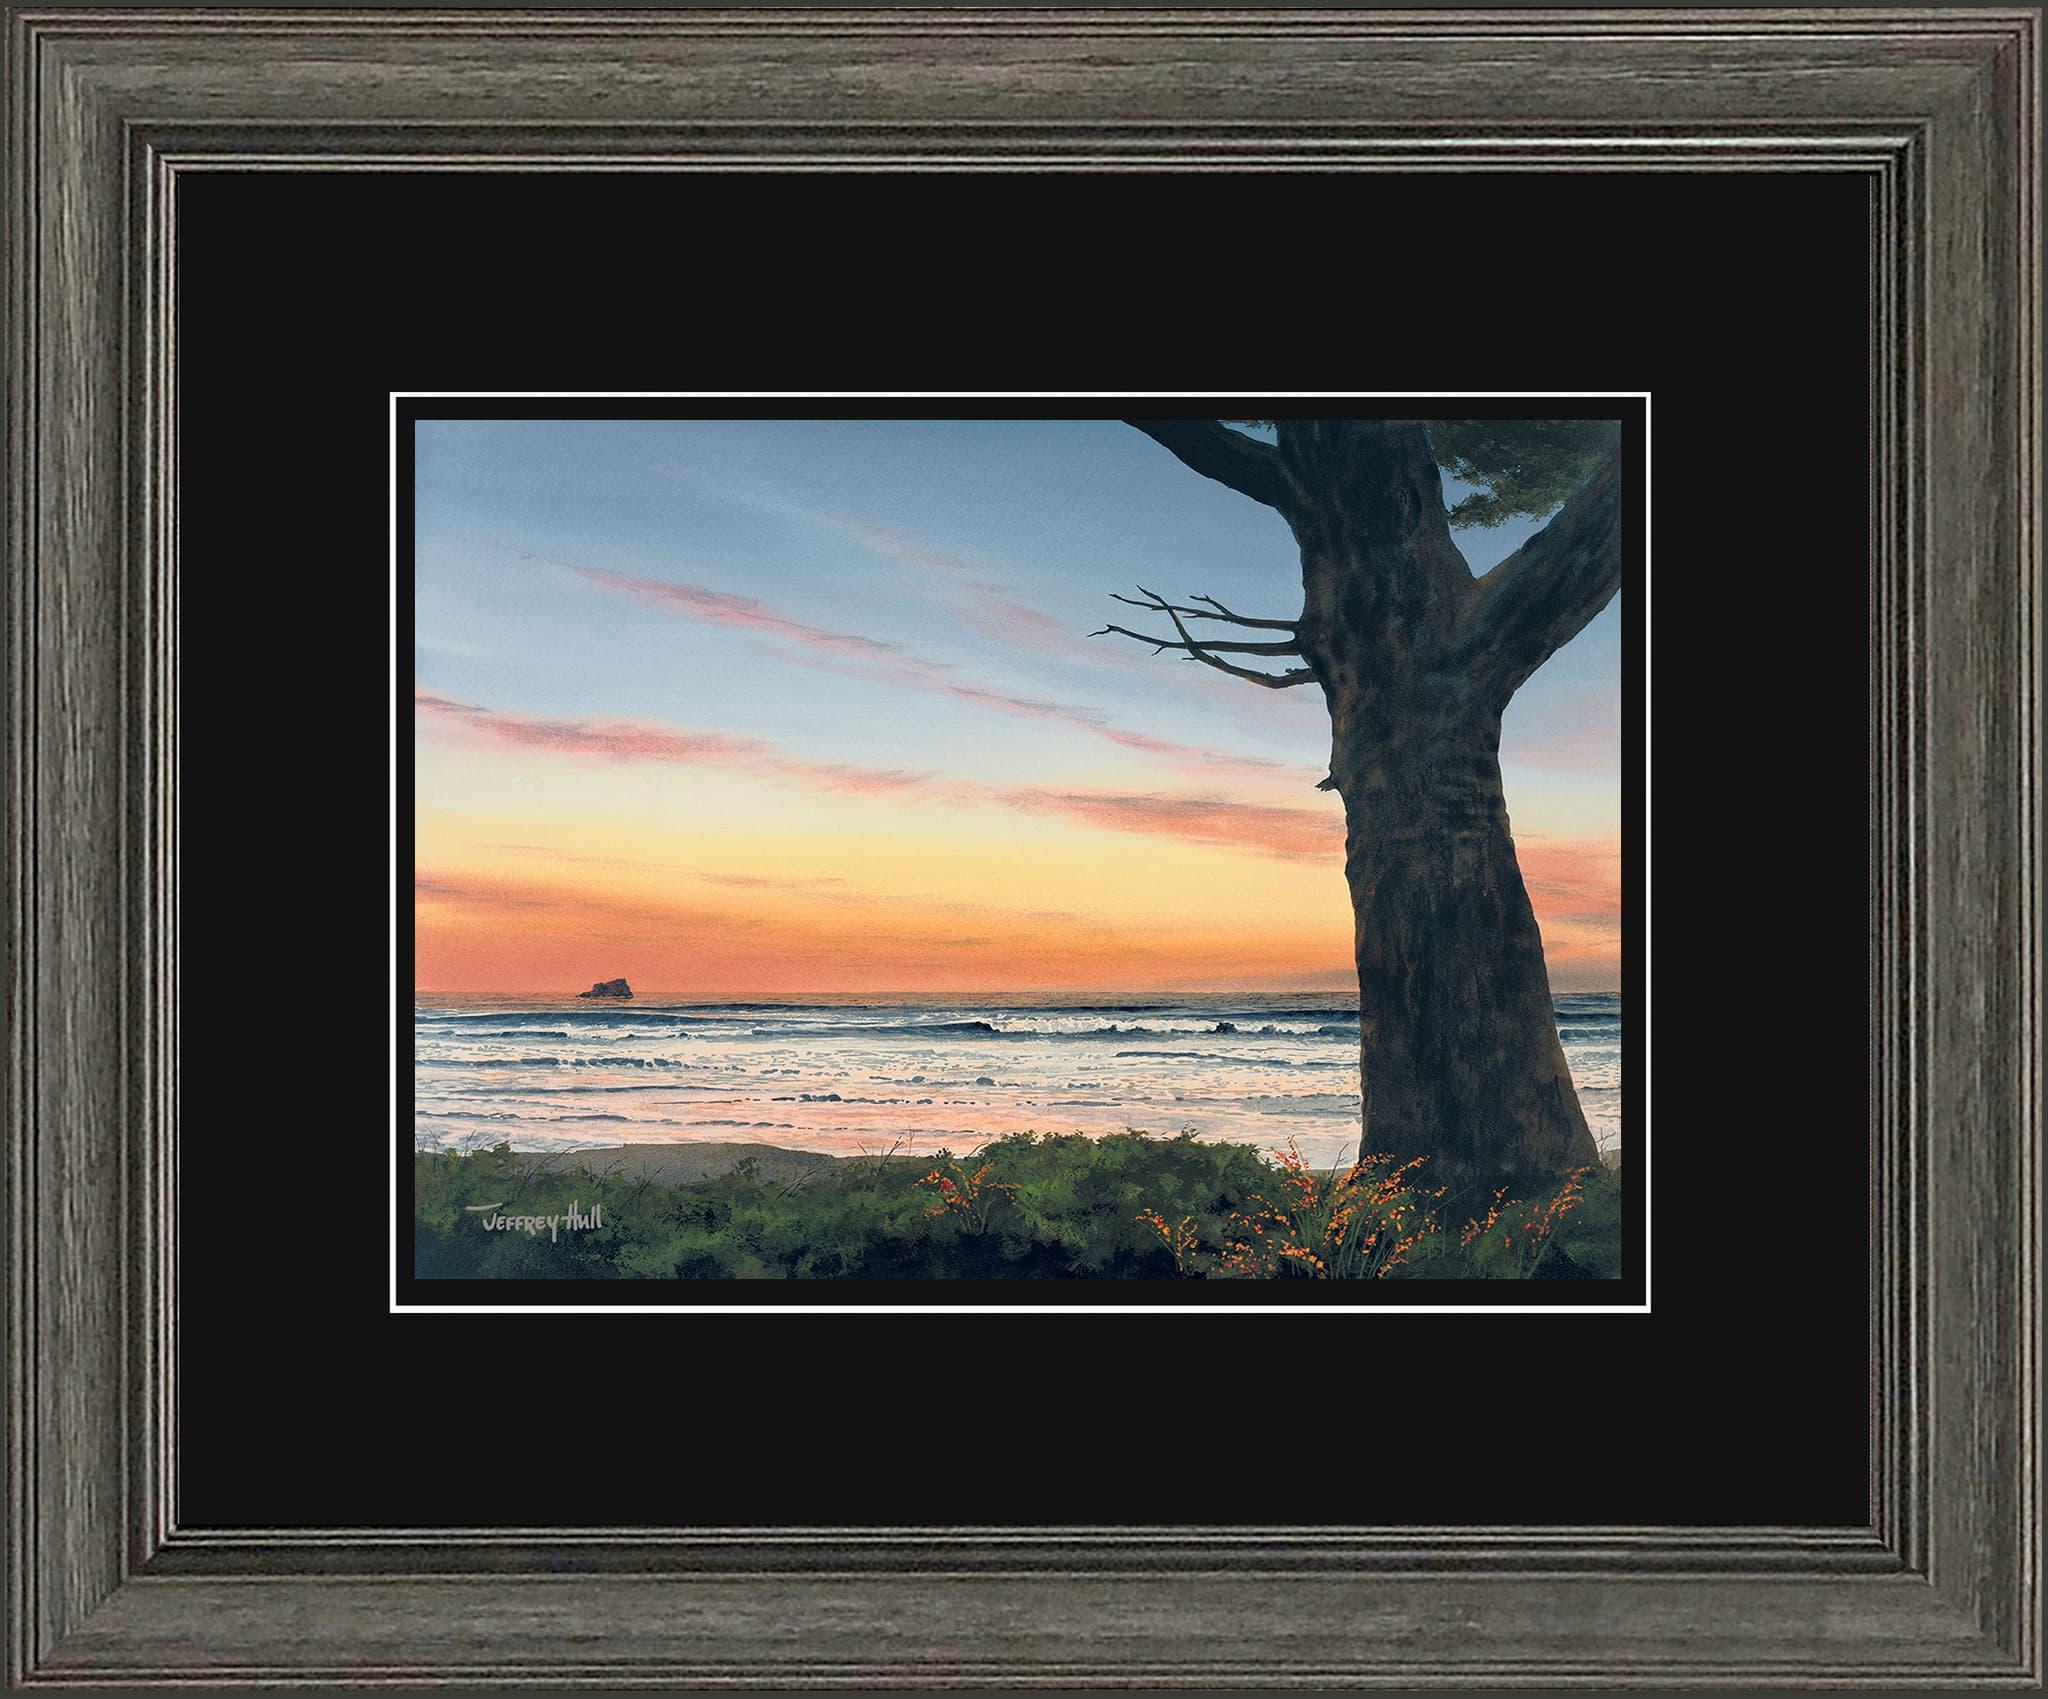 Sunset-Overlook-OpenEd-Cascade-Jet-Black-4-Website-2021